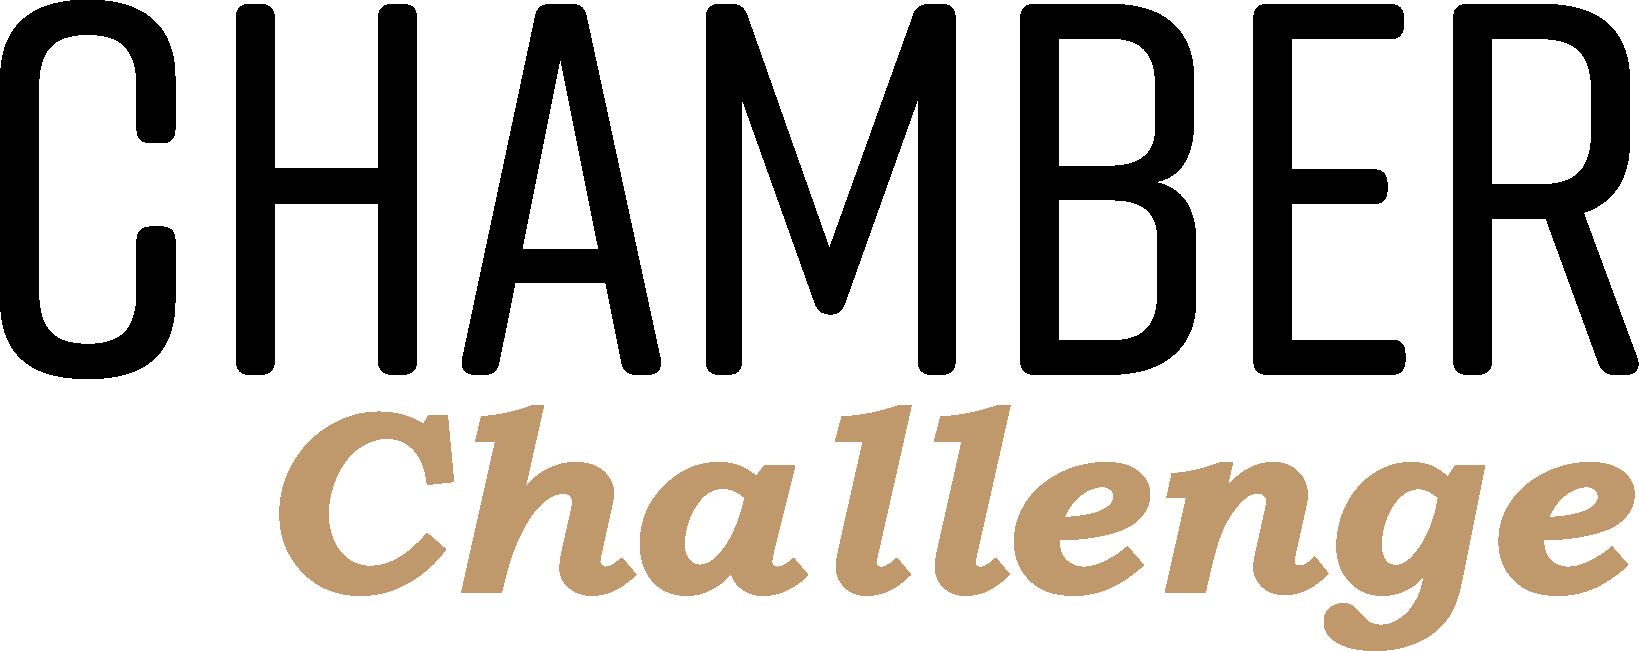 Chamber Challenge text